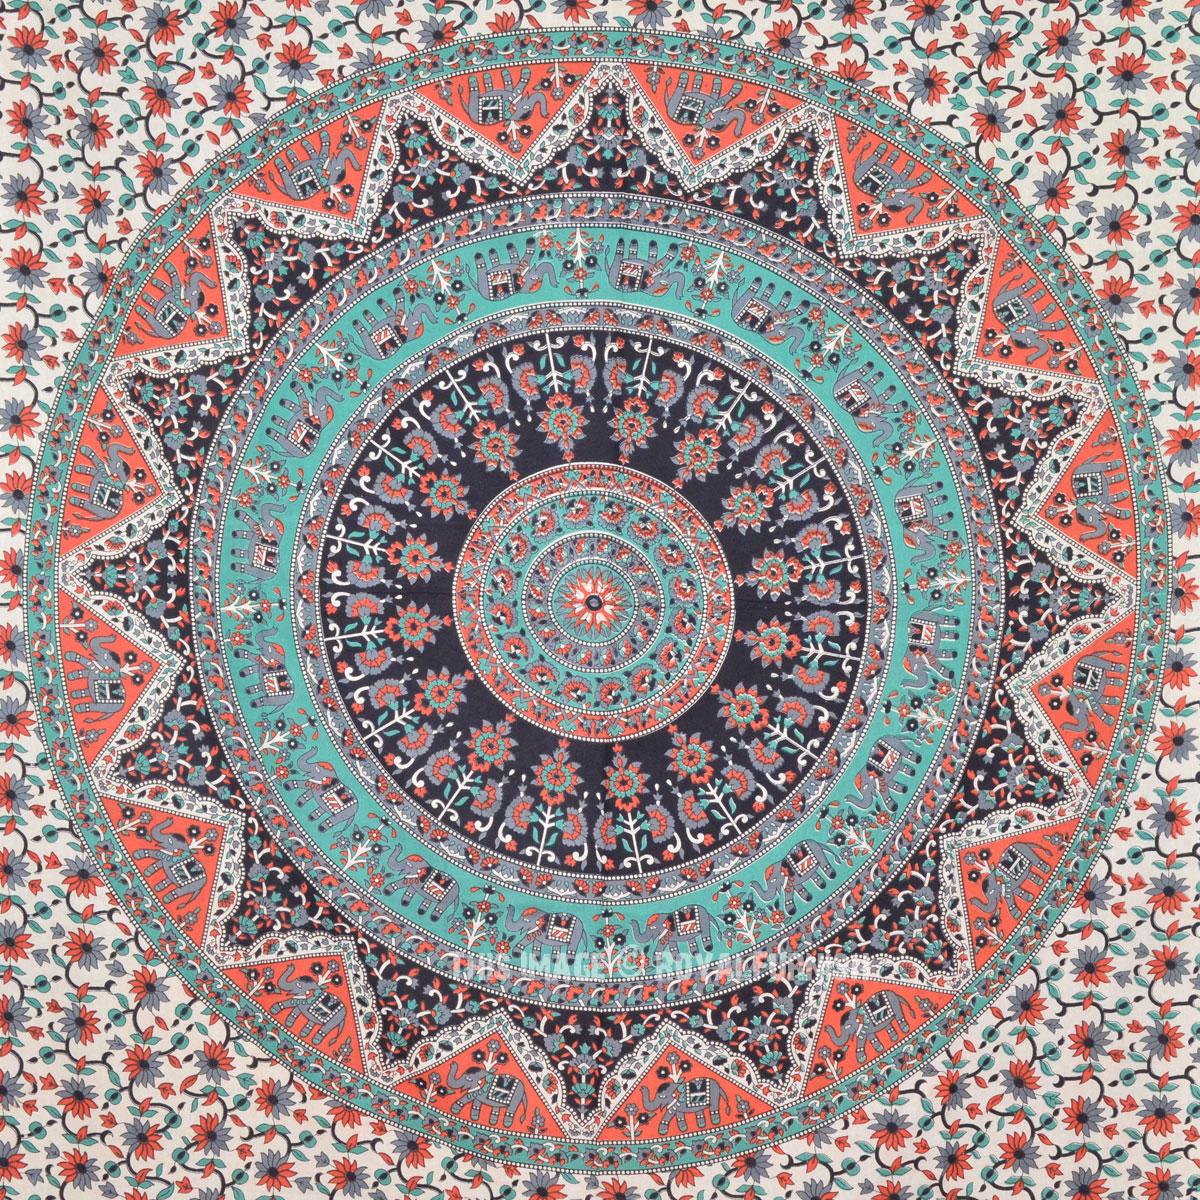 Blue multi elephants sun ombre mandala wall tapestry royalfurnish - Multi Paisley Bohemian Mandala Circle Wall Tapestry Bedding Royalfurnish Com